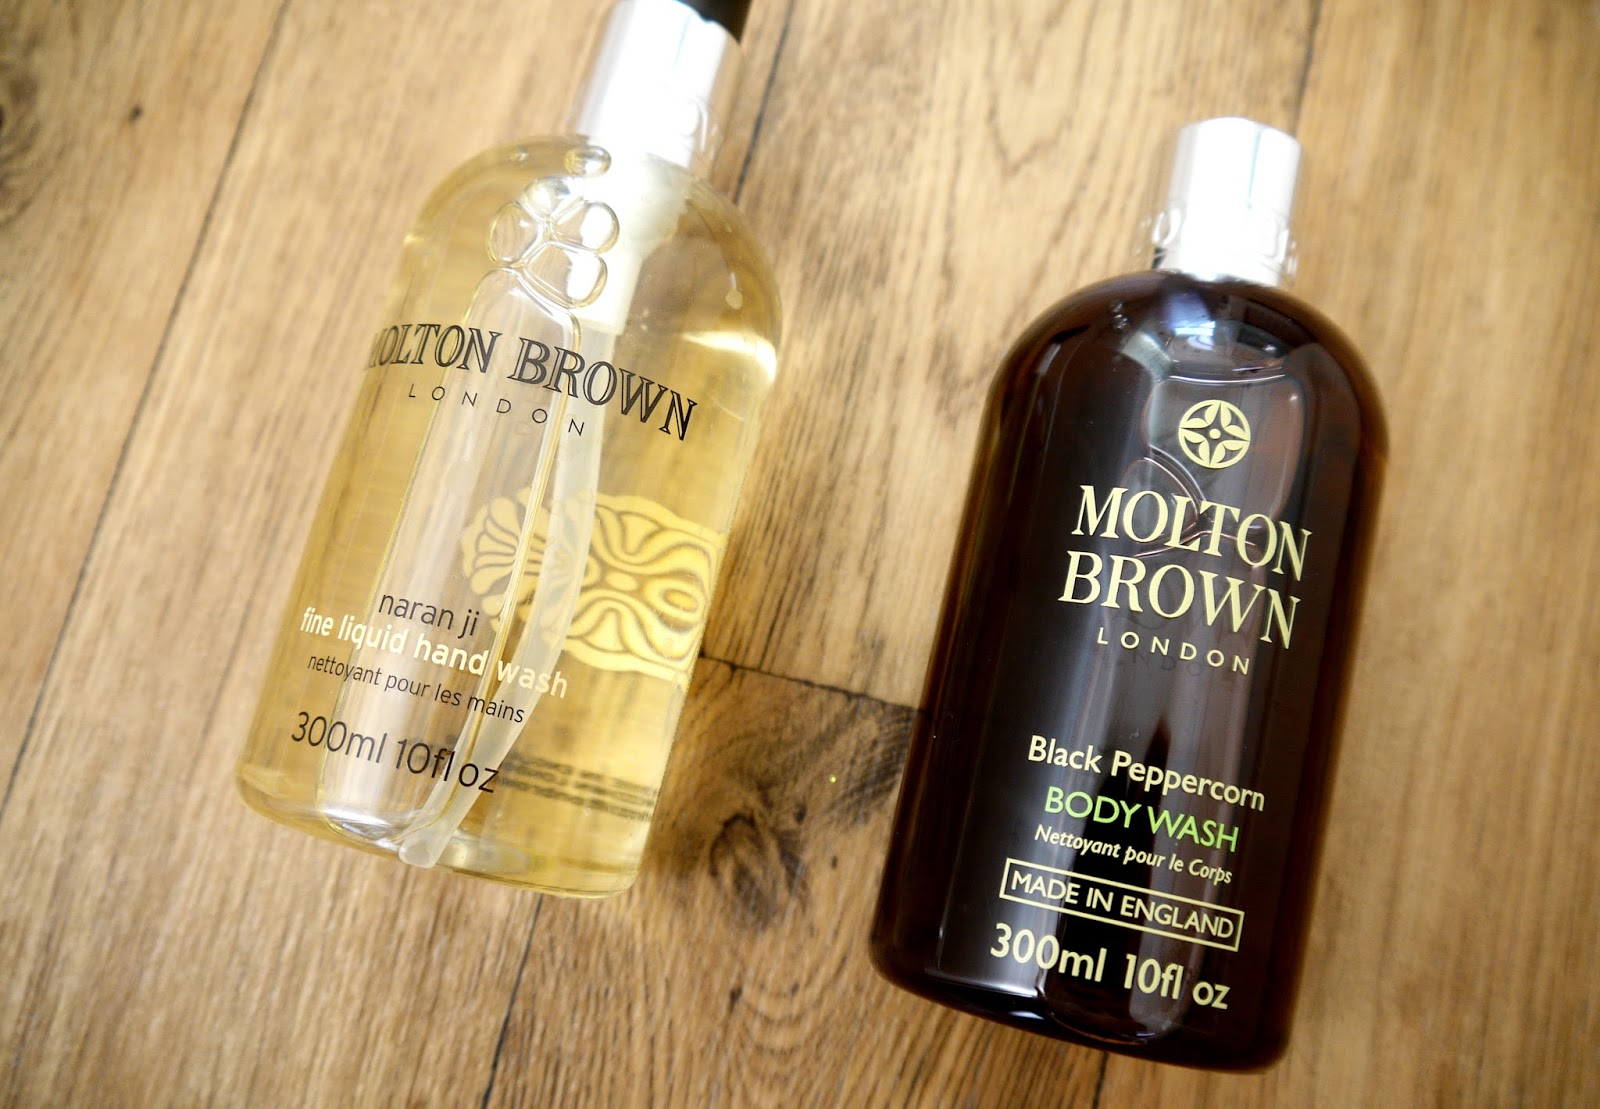 8b4626d6dfcf Molton Brown Naran Ji and Black Peppercorn Shower Gel - The Beauty Type